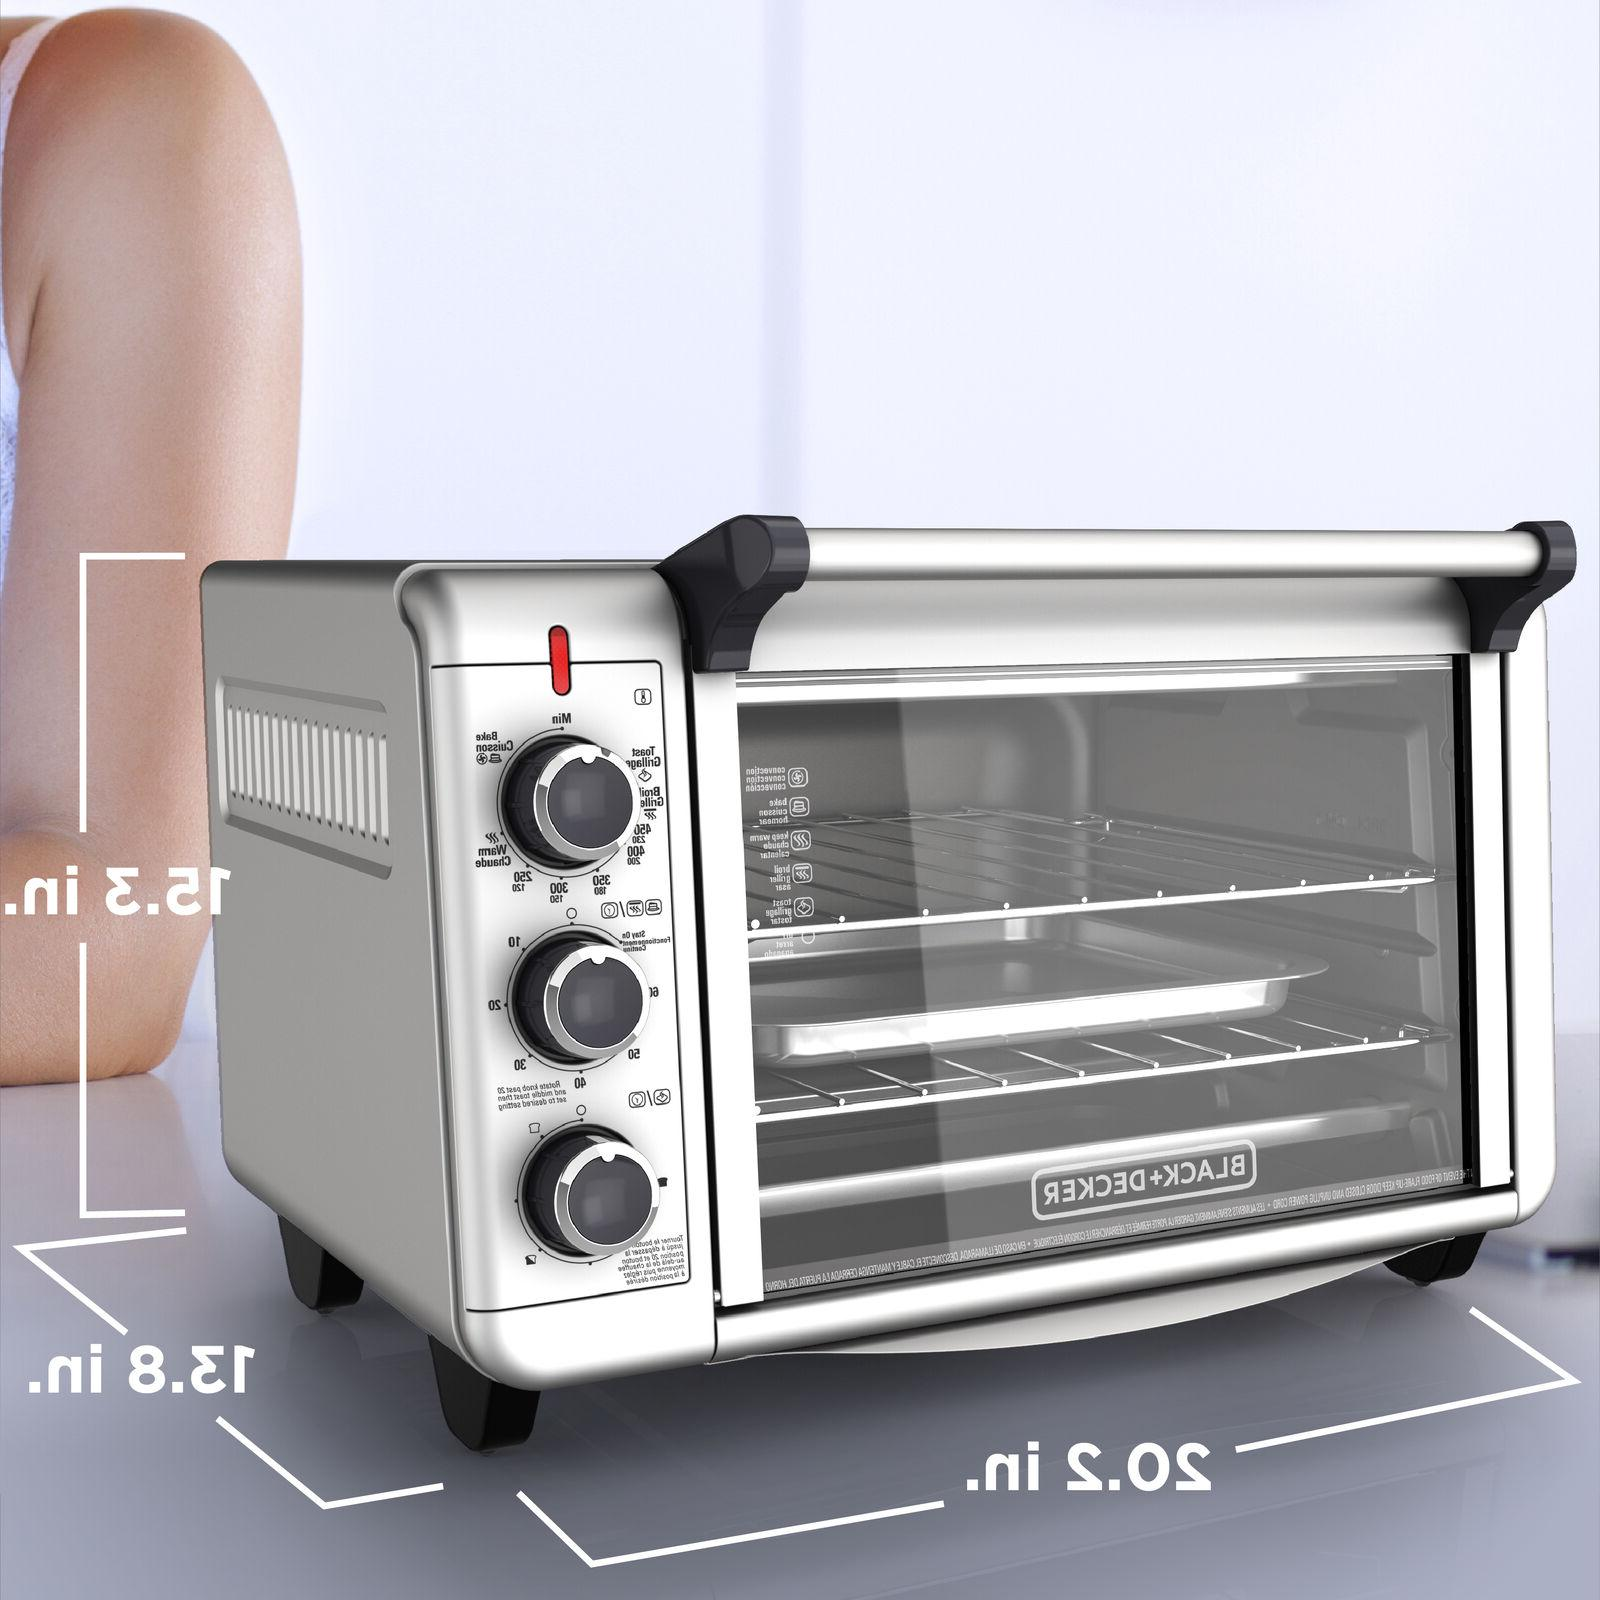 BLACK+DECKER 6-Slice Countertop Toaster Oven - Silver